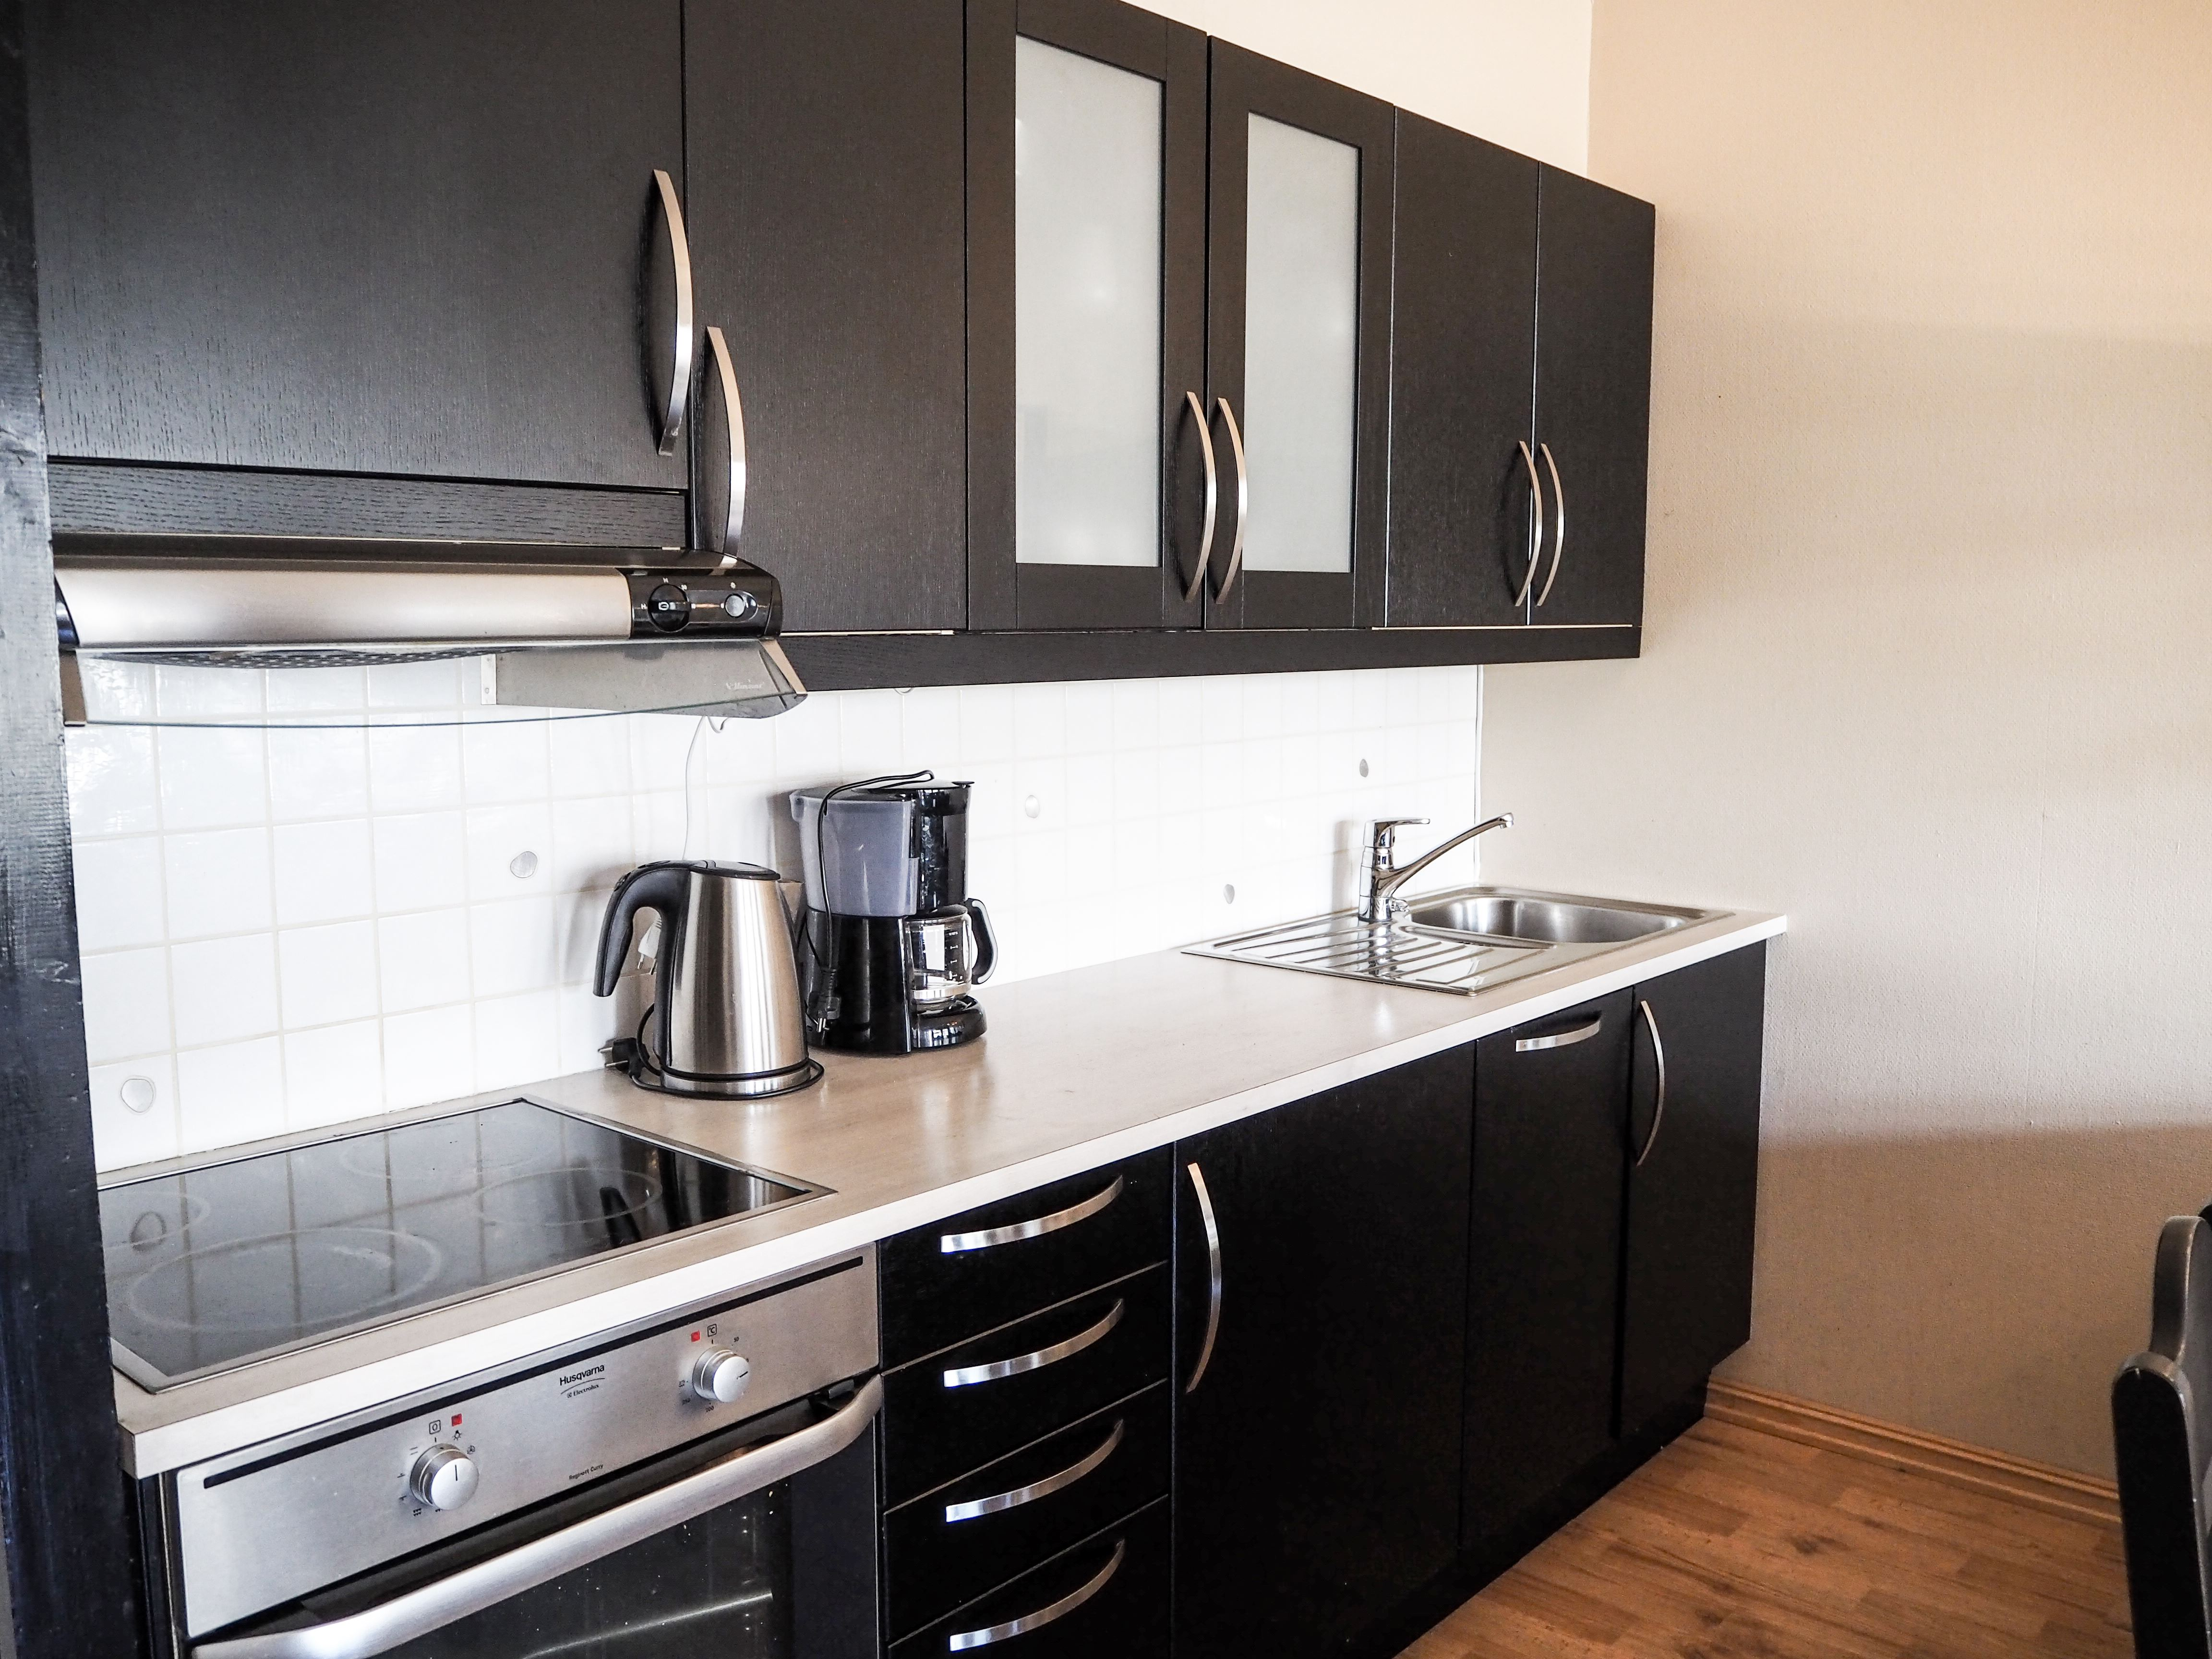 Leilighet 310 / Apartment 310